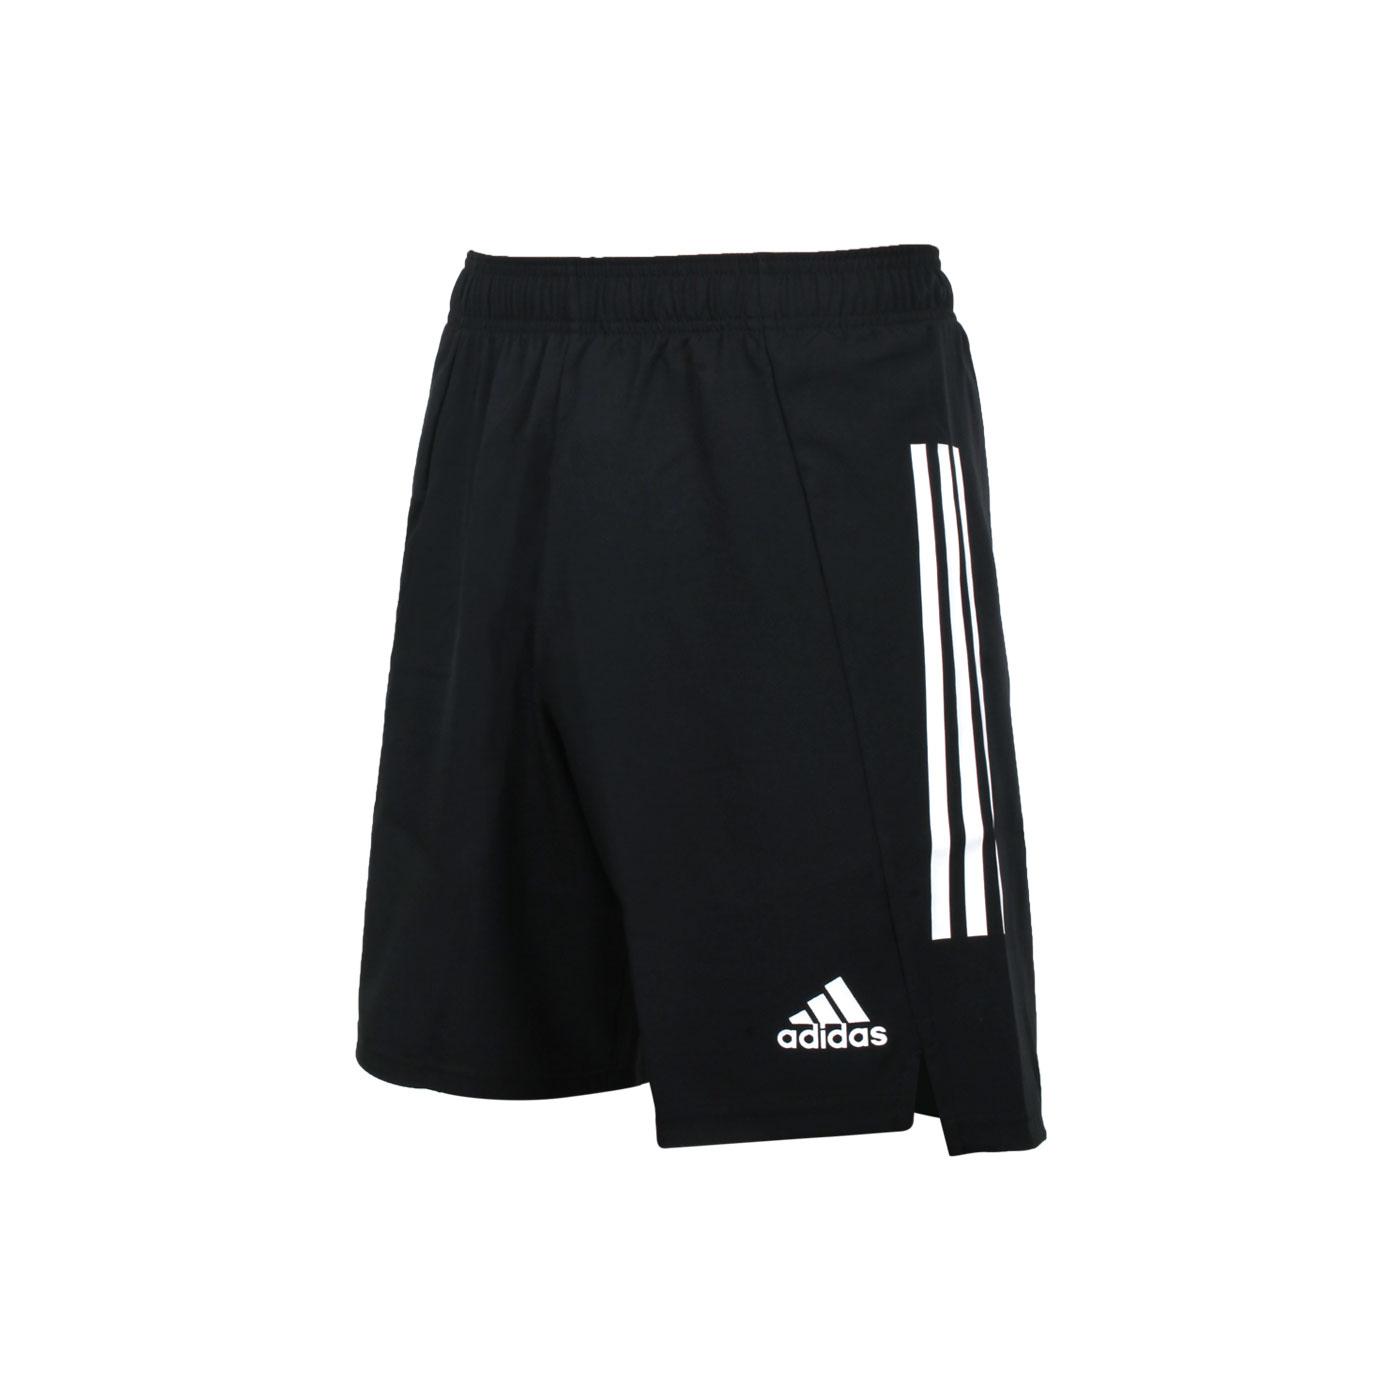 ADIDAS 男款運動短褲 GJ6804 - 黑白